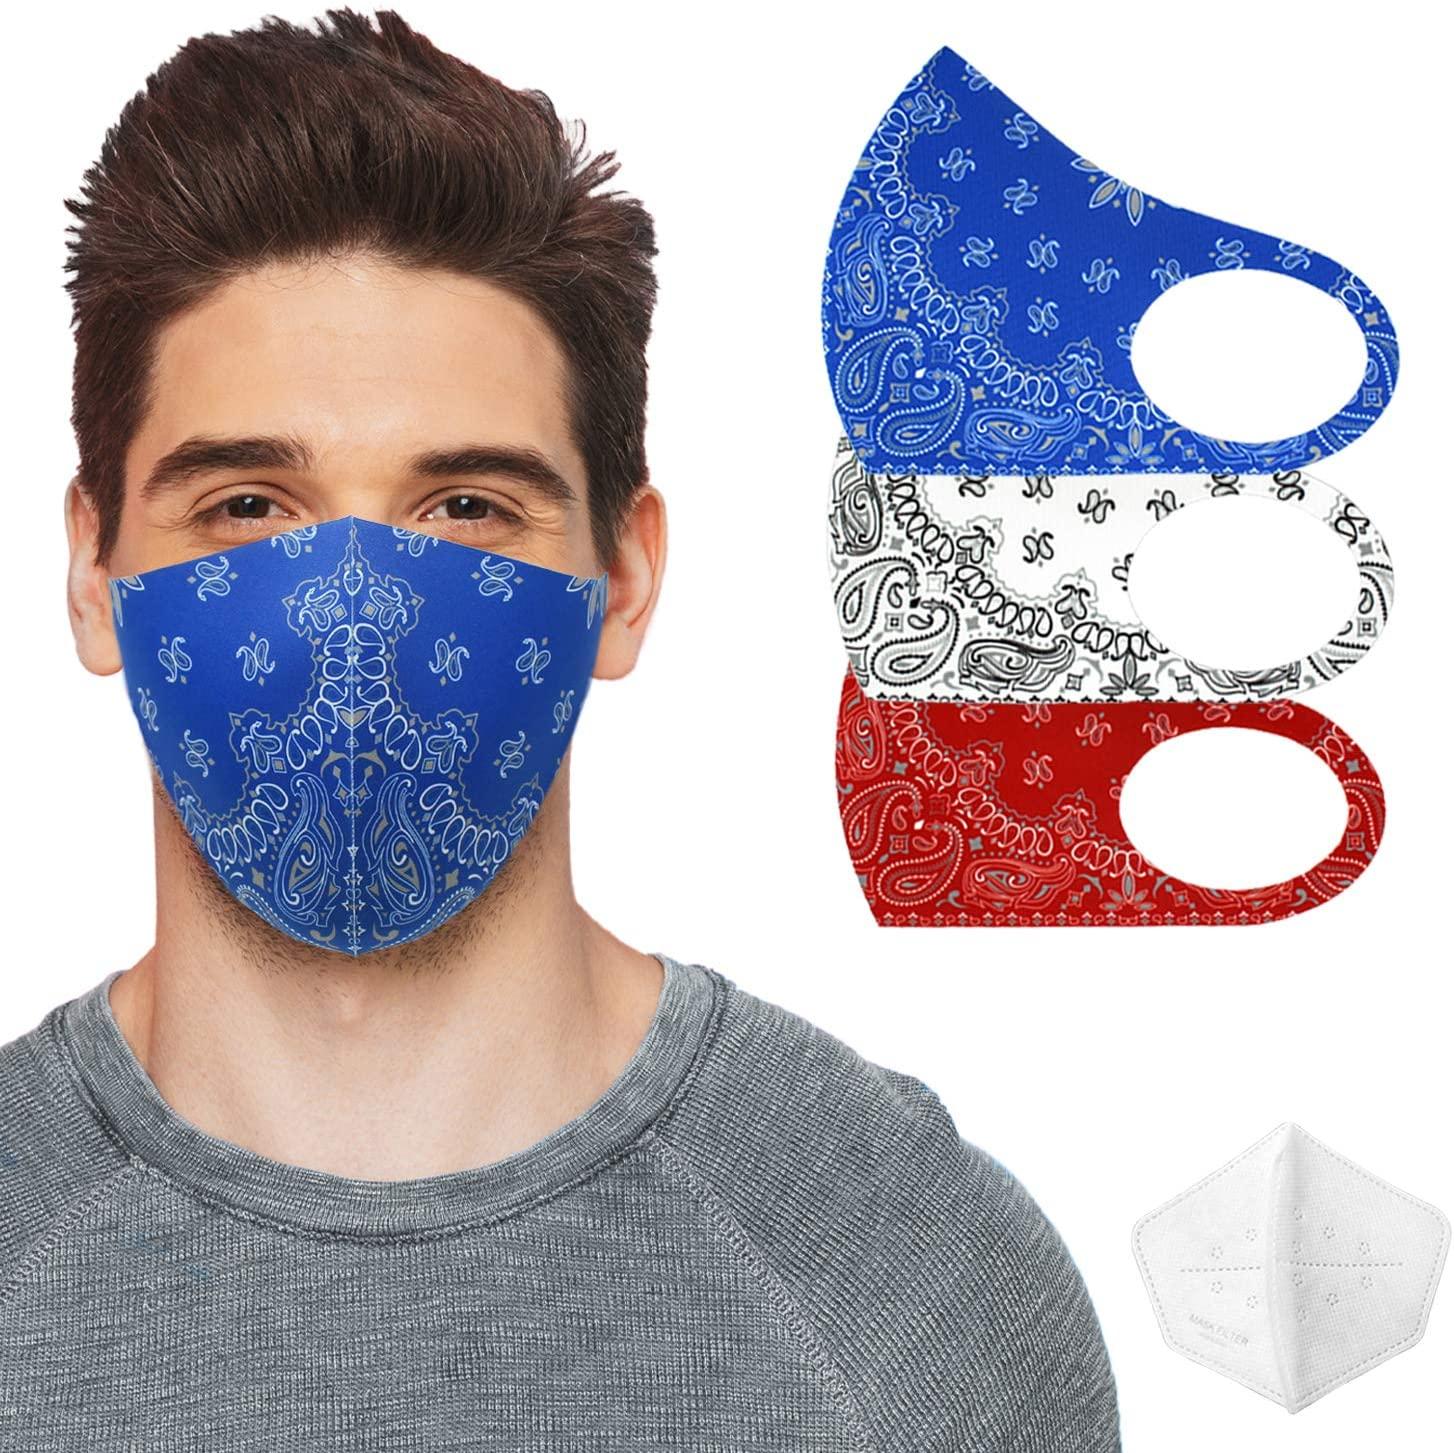 Unisex Fashion Paisley Paisley Washable Breathable Reusable Face Mask - Made in Korea (3, BL/WT/RD Paisley & 3 FiIter Set)